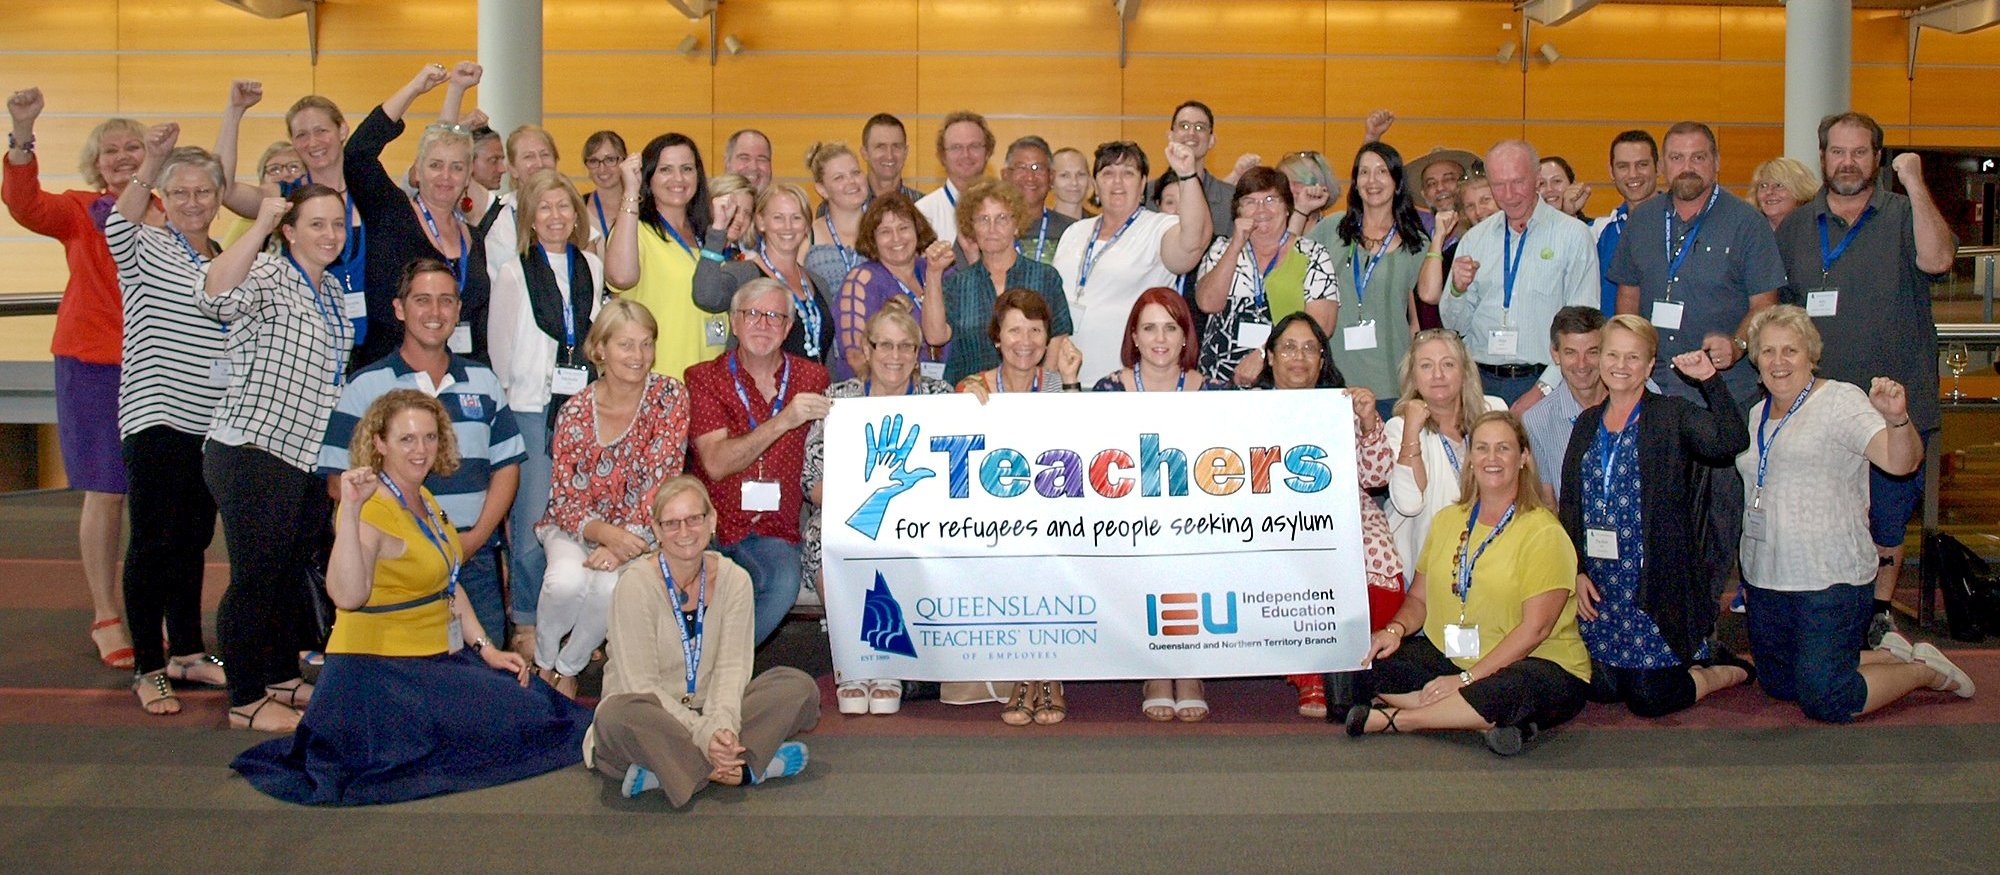 Queensland teachers vote to walk off for refugees